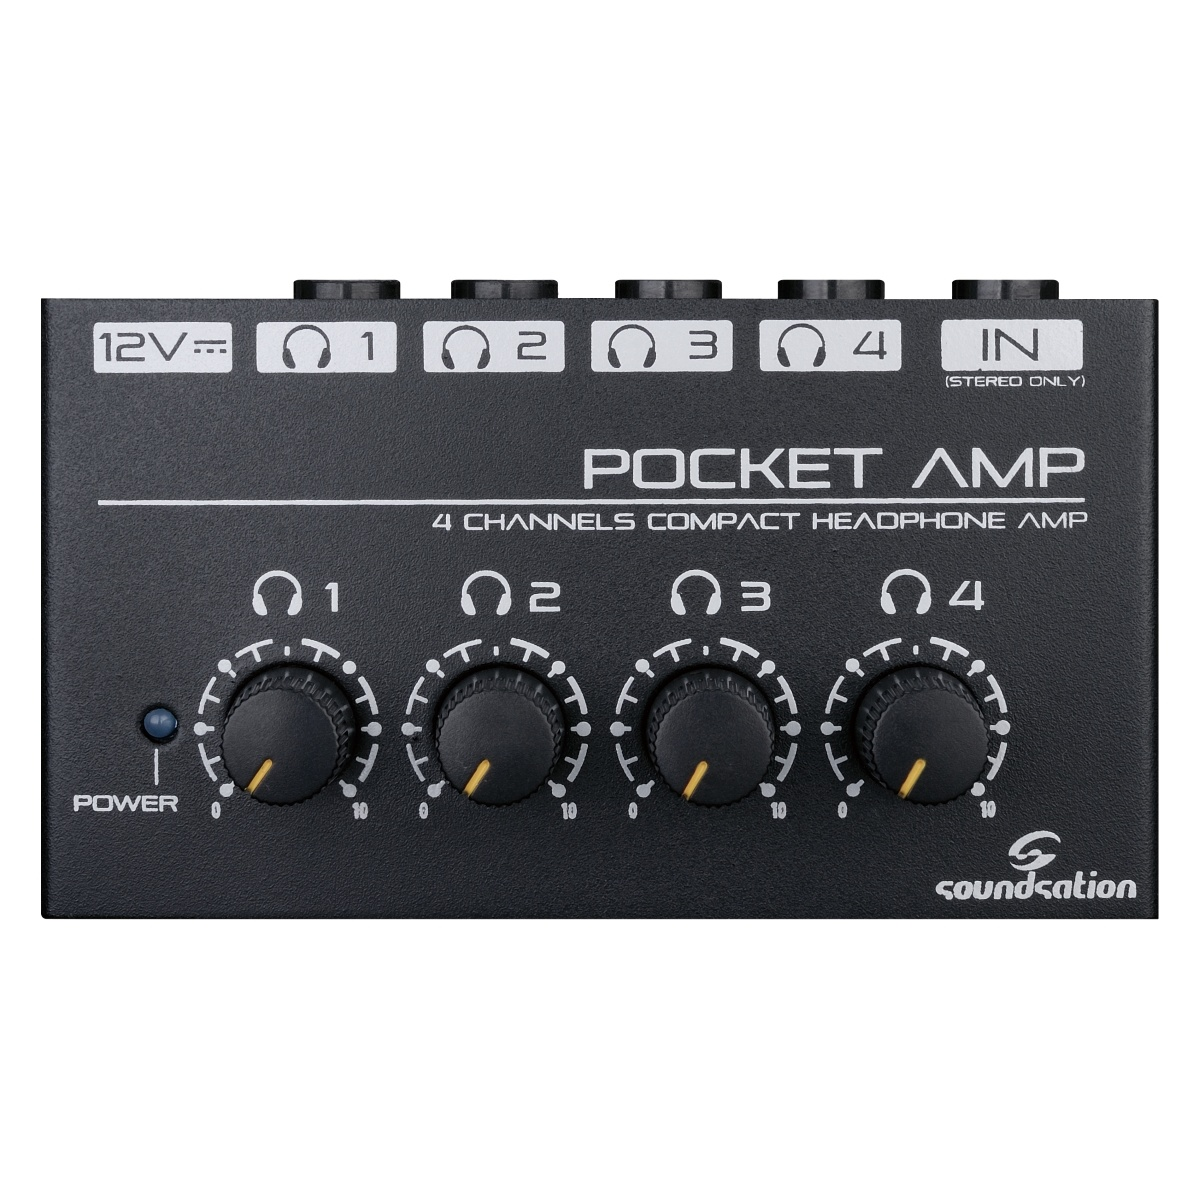 Soundsation Pocket Amp Mini Headphone Amplifier